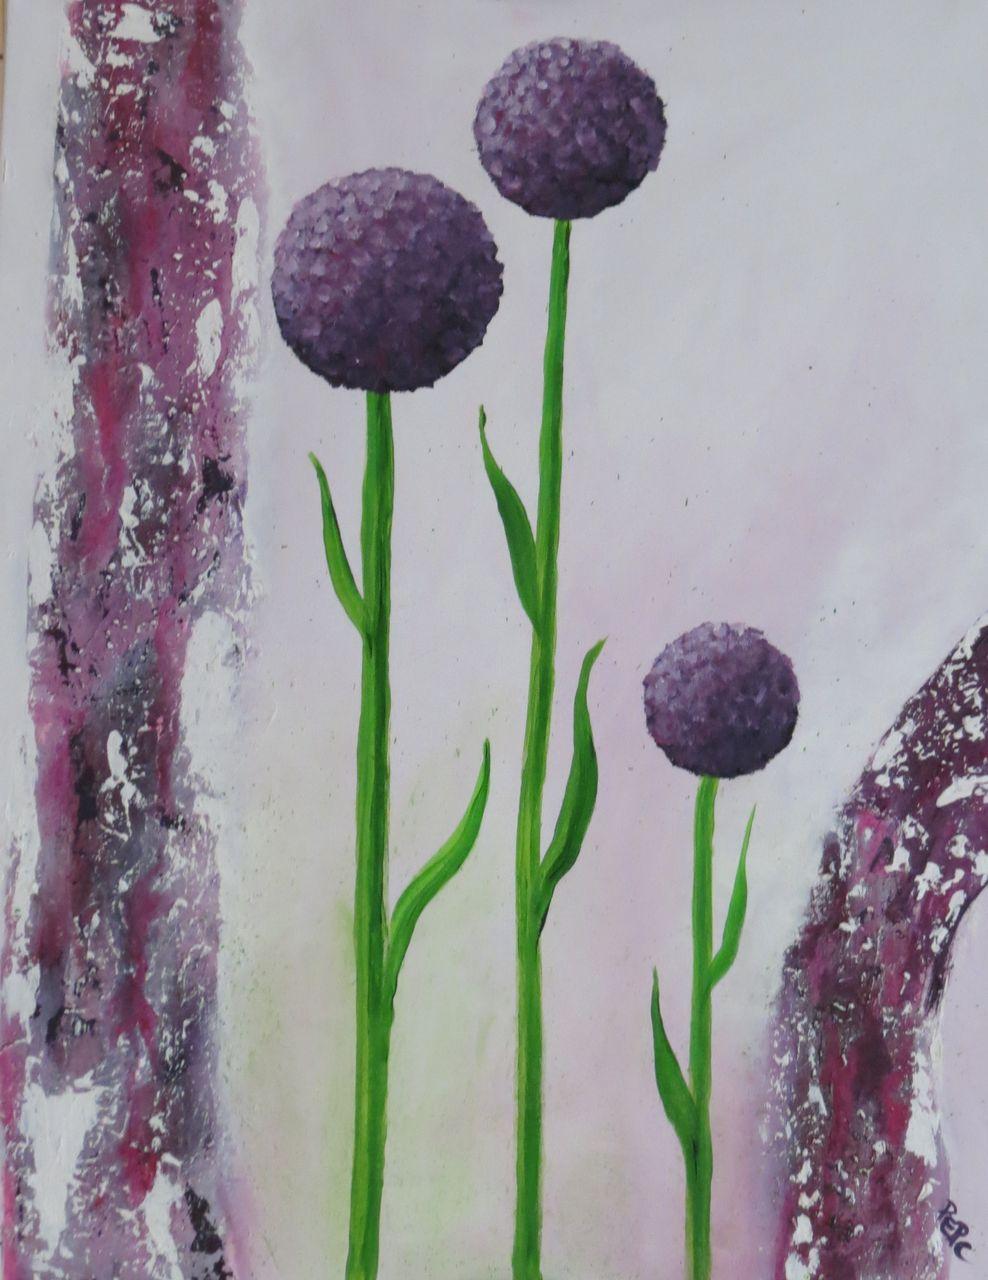 bild strukturpaste blumen lauch lila von elke p bei kunstnet. Black Bedroom Furniture Sets. Home Design Ideas